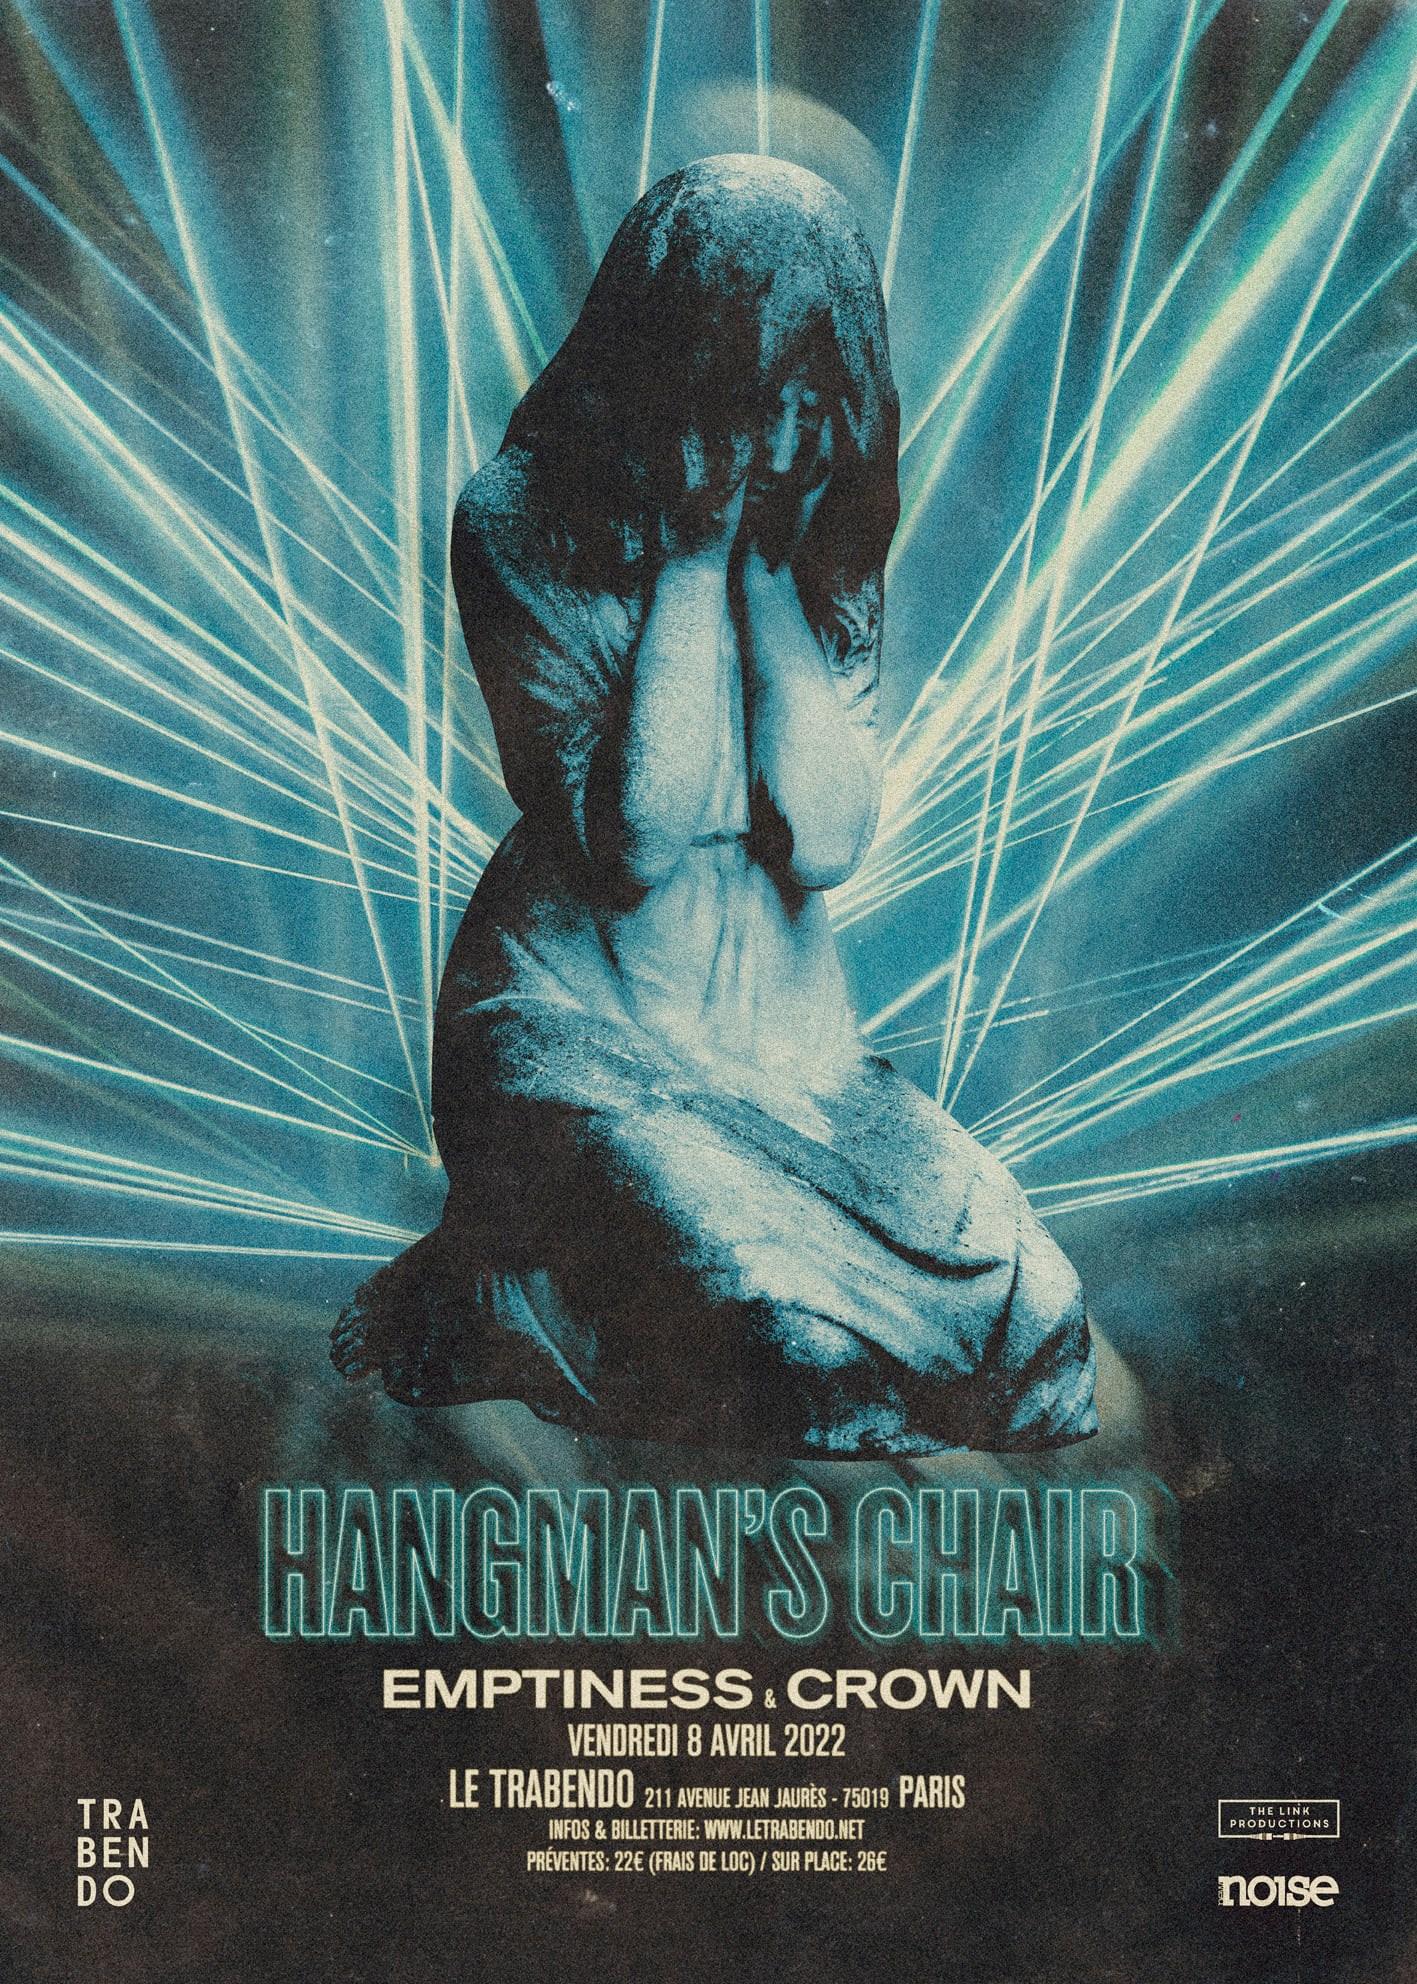 Hangman's Chair + Crown + Emptiness @ Le Trabendo (Paris (75)) - 08 avril 2022